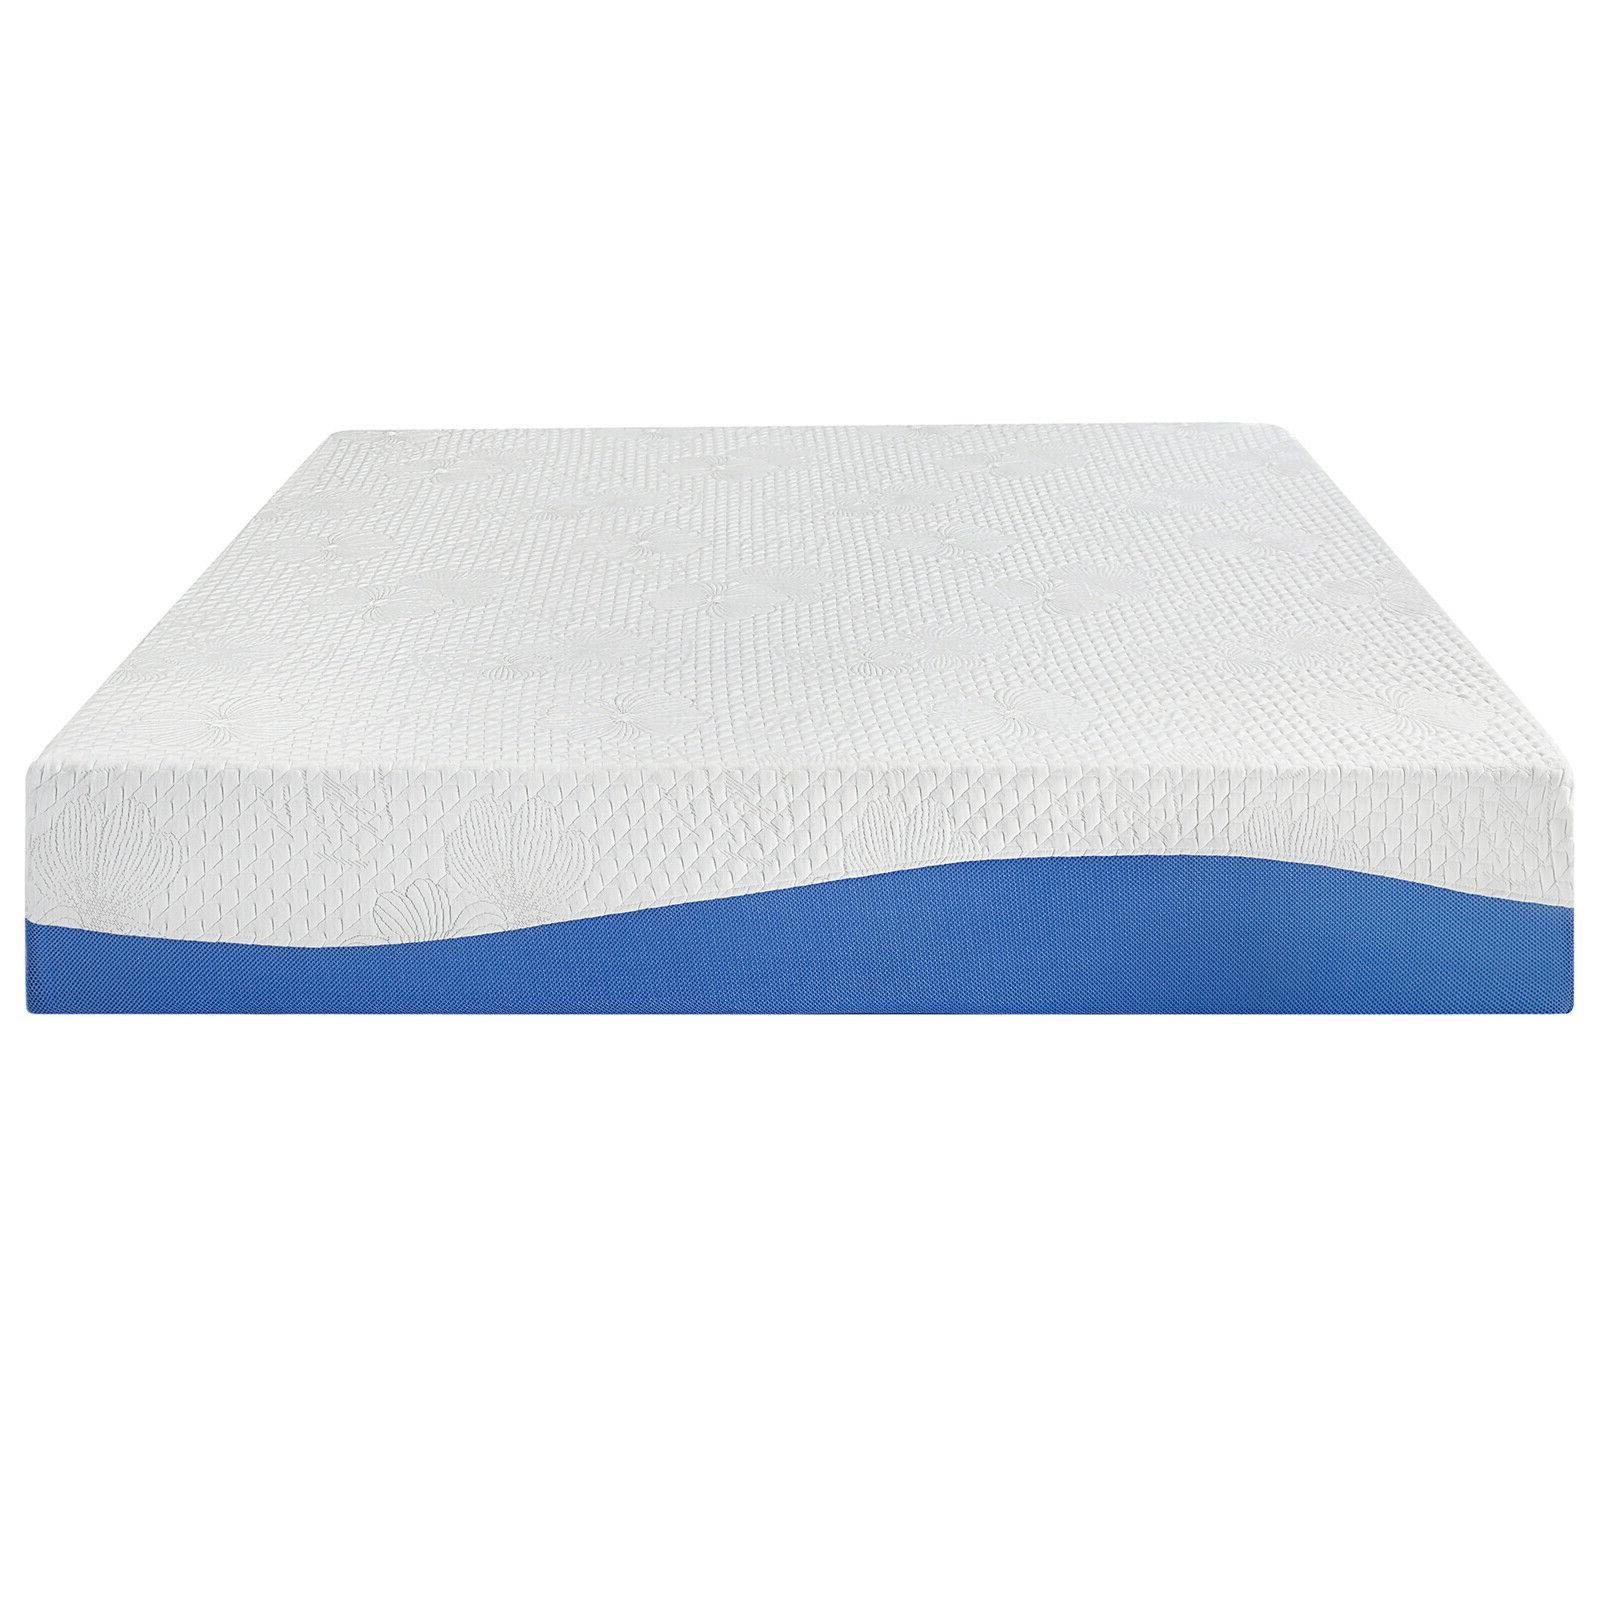 GranRest 10 Gel Foam Mattress-in-a-Box, Queen